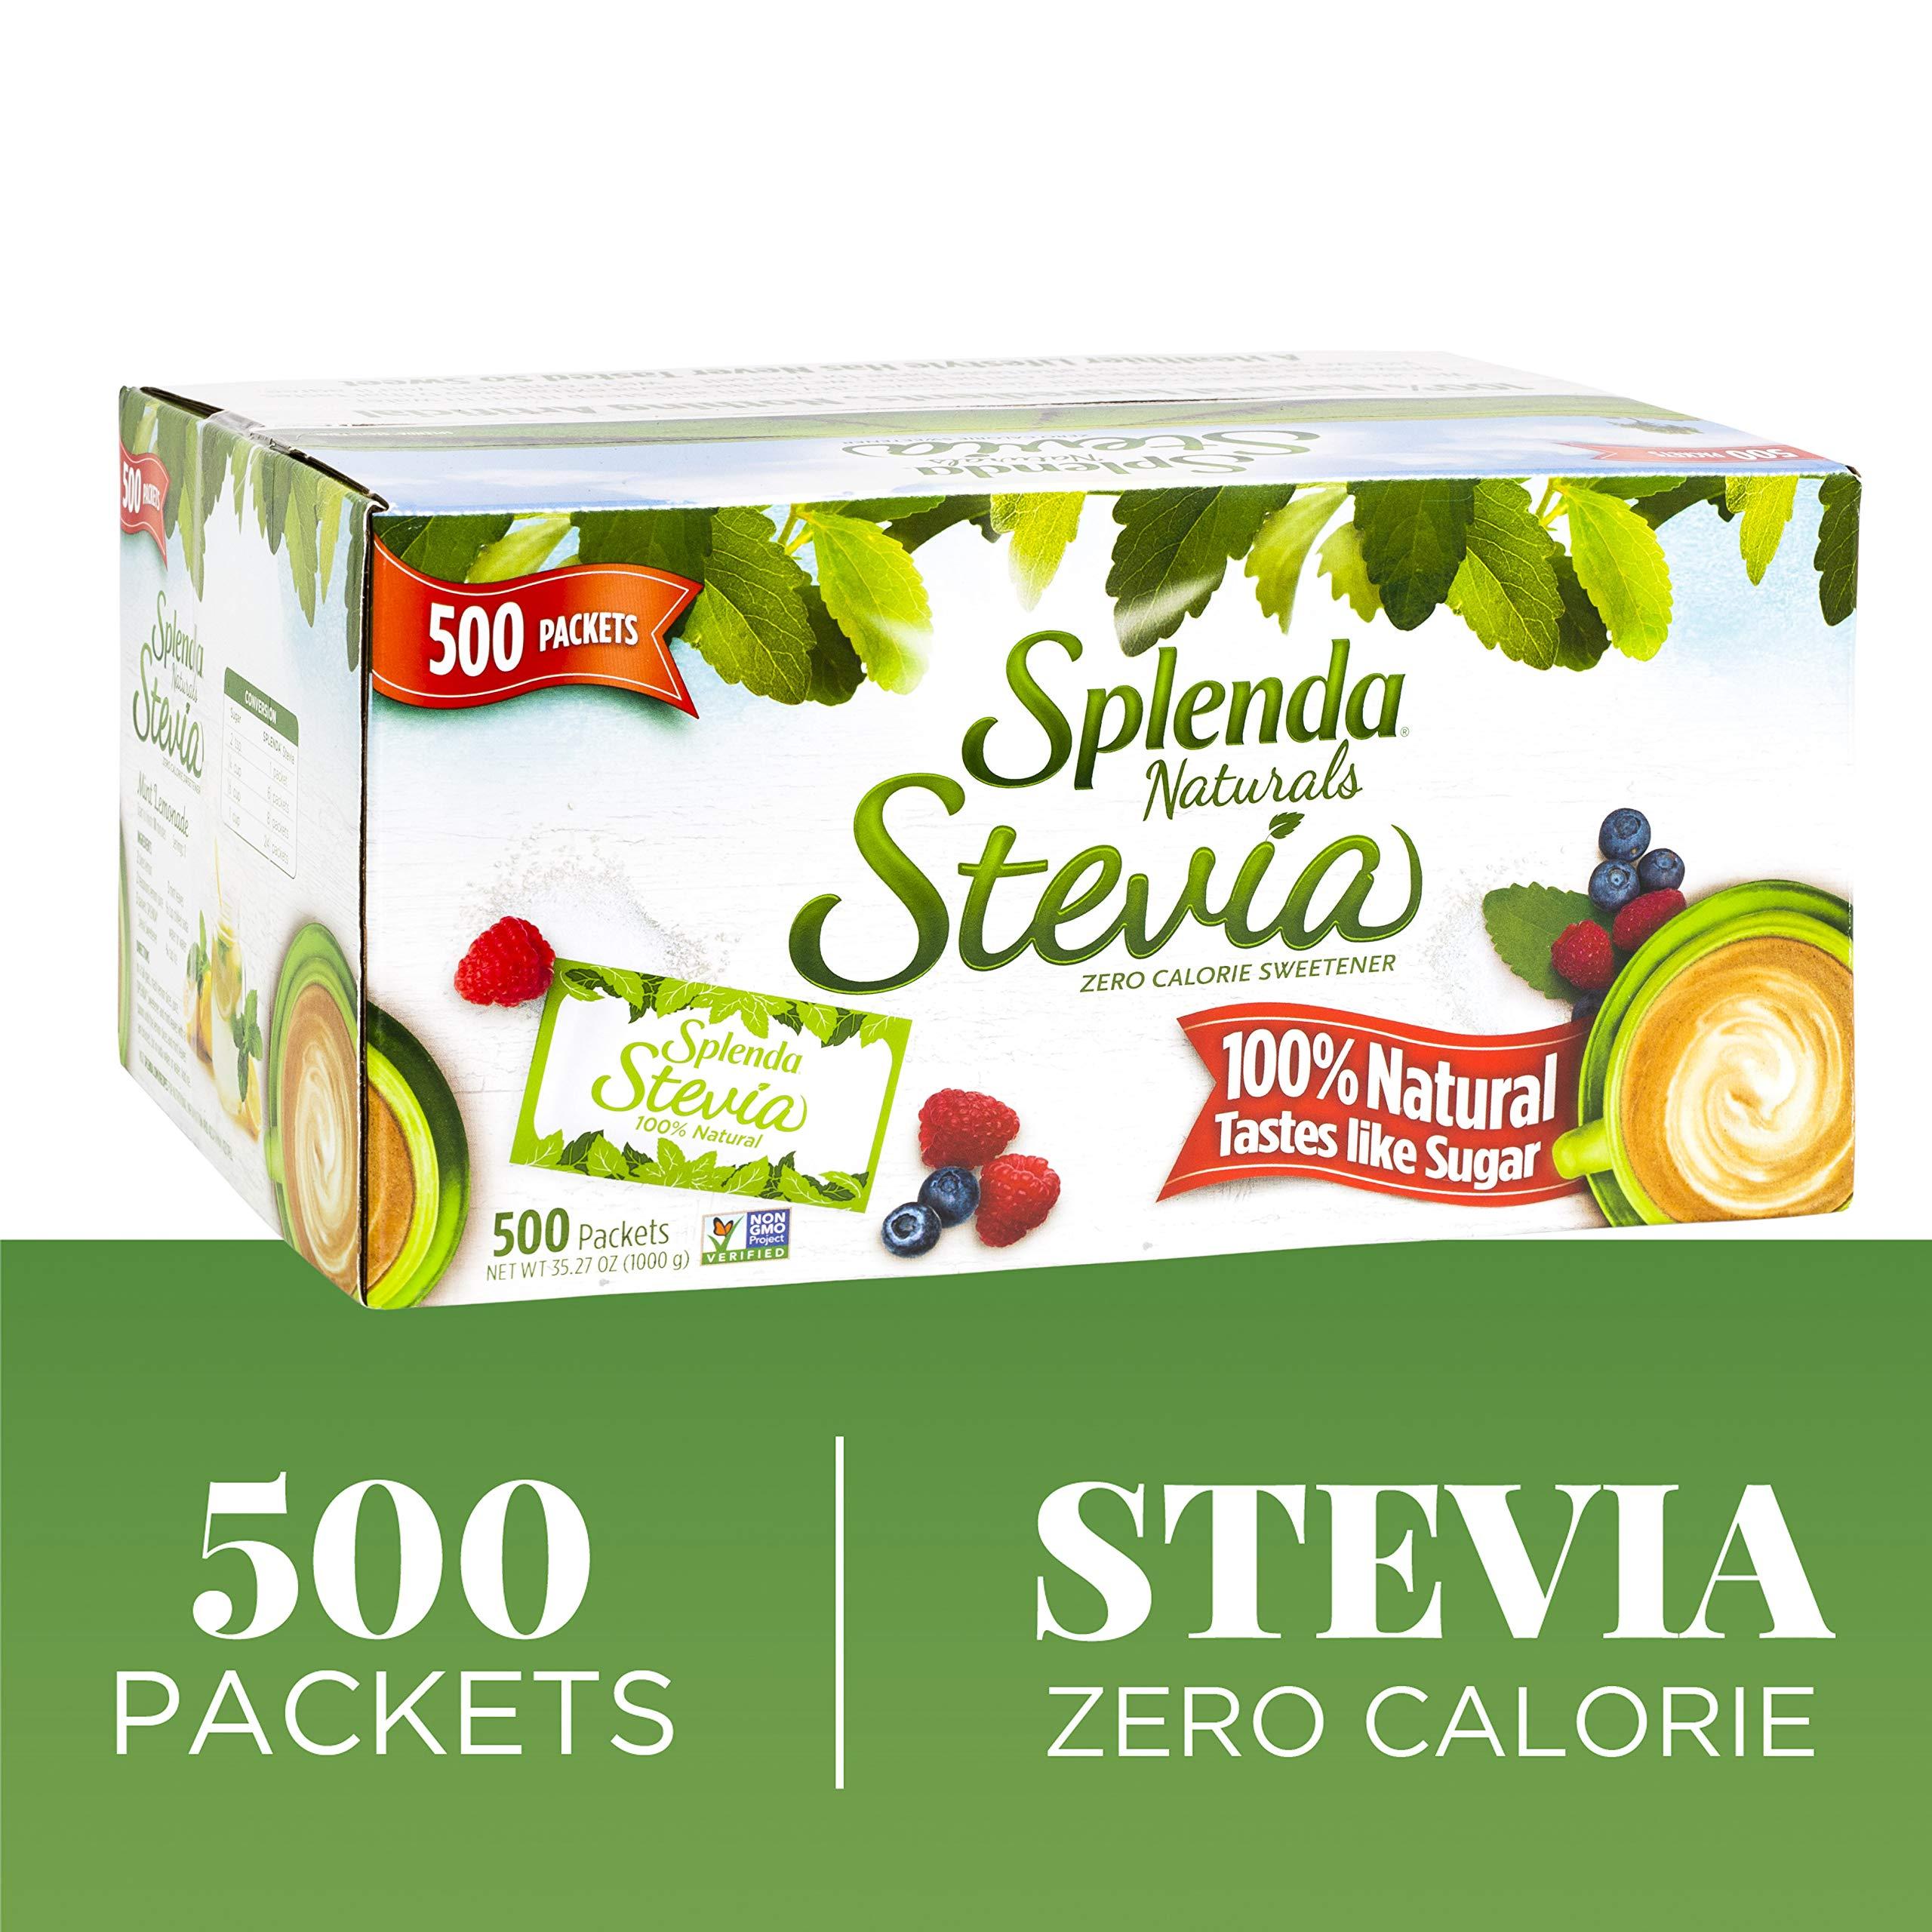 Splenda Naturals Stevia Sweetener Packets, 500 Ct -- Zero Calorie Stevia Sweetener. 100% Natural, Nothing Artificial, Best Tasting Stevia, No Bitter Aftertaste. Taste of Sugar Without the Calories. by Splenda